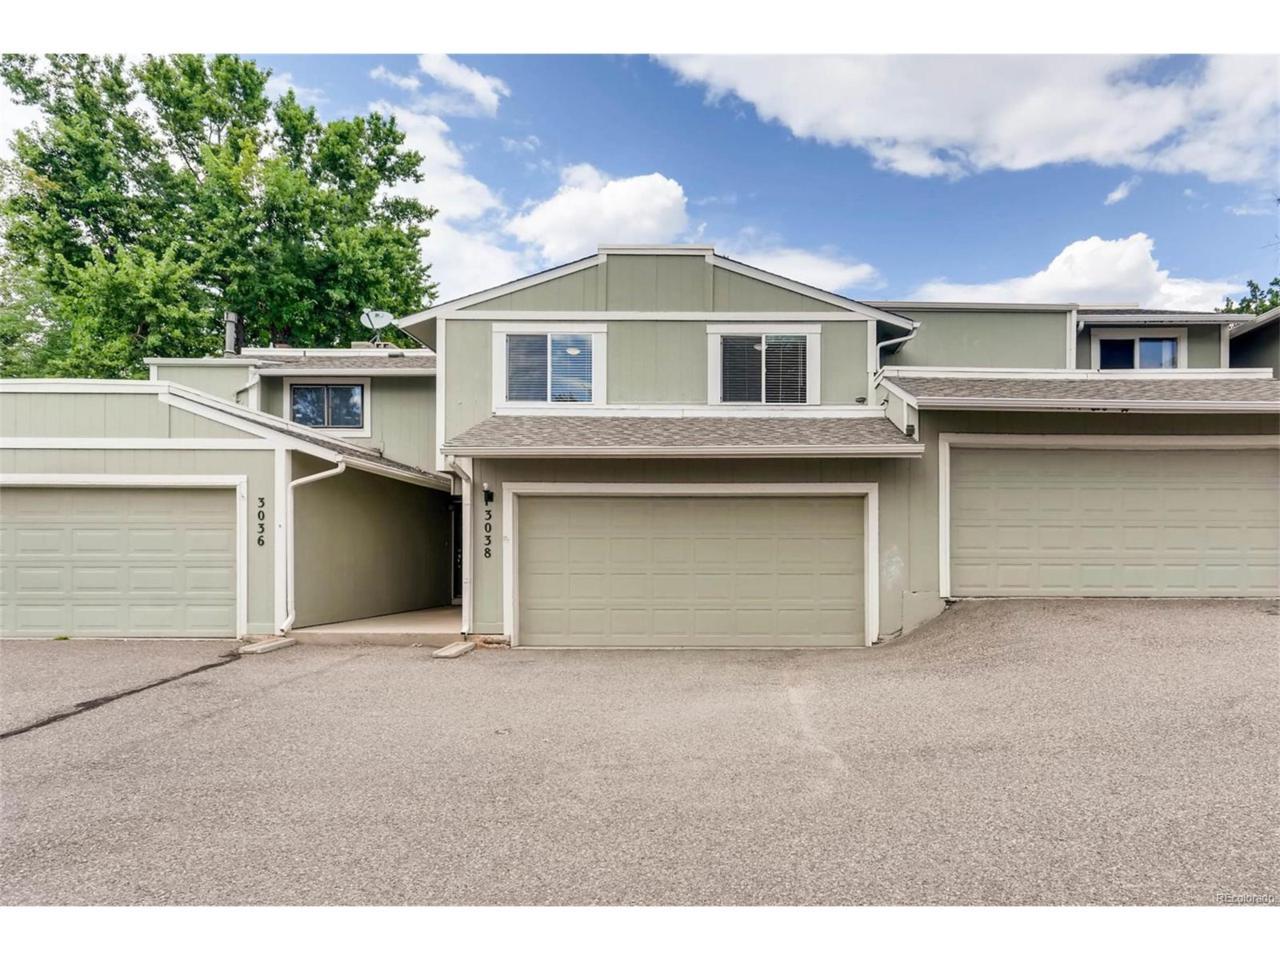 3038 S Macon Circle, Aurora, CO 80014 (MLS #3896460) :: 8z Real Estate